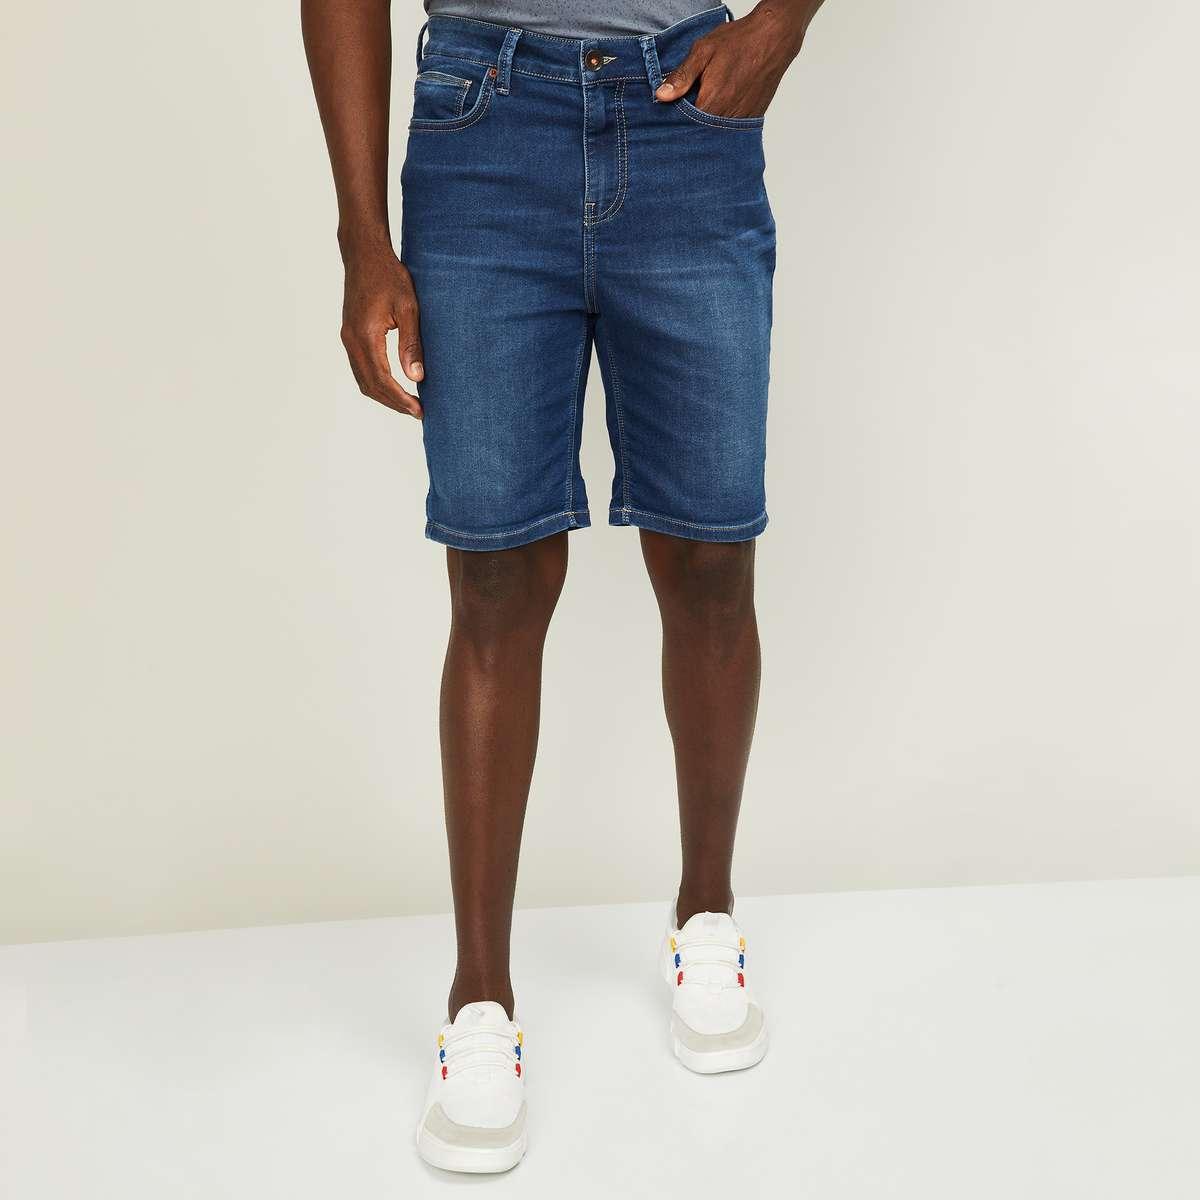 2.UNITED COLORS OF BENETTON Men Stonewashed Slim Fit Denim Shorts